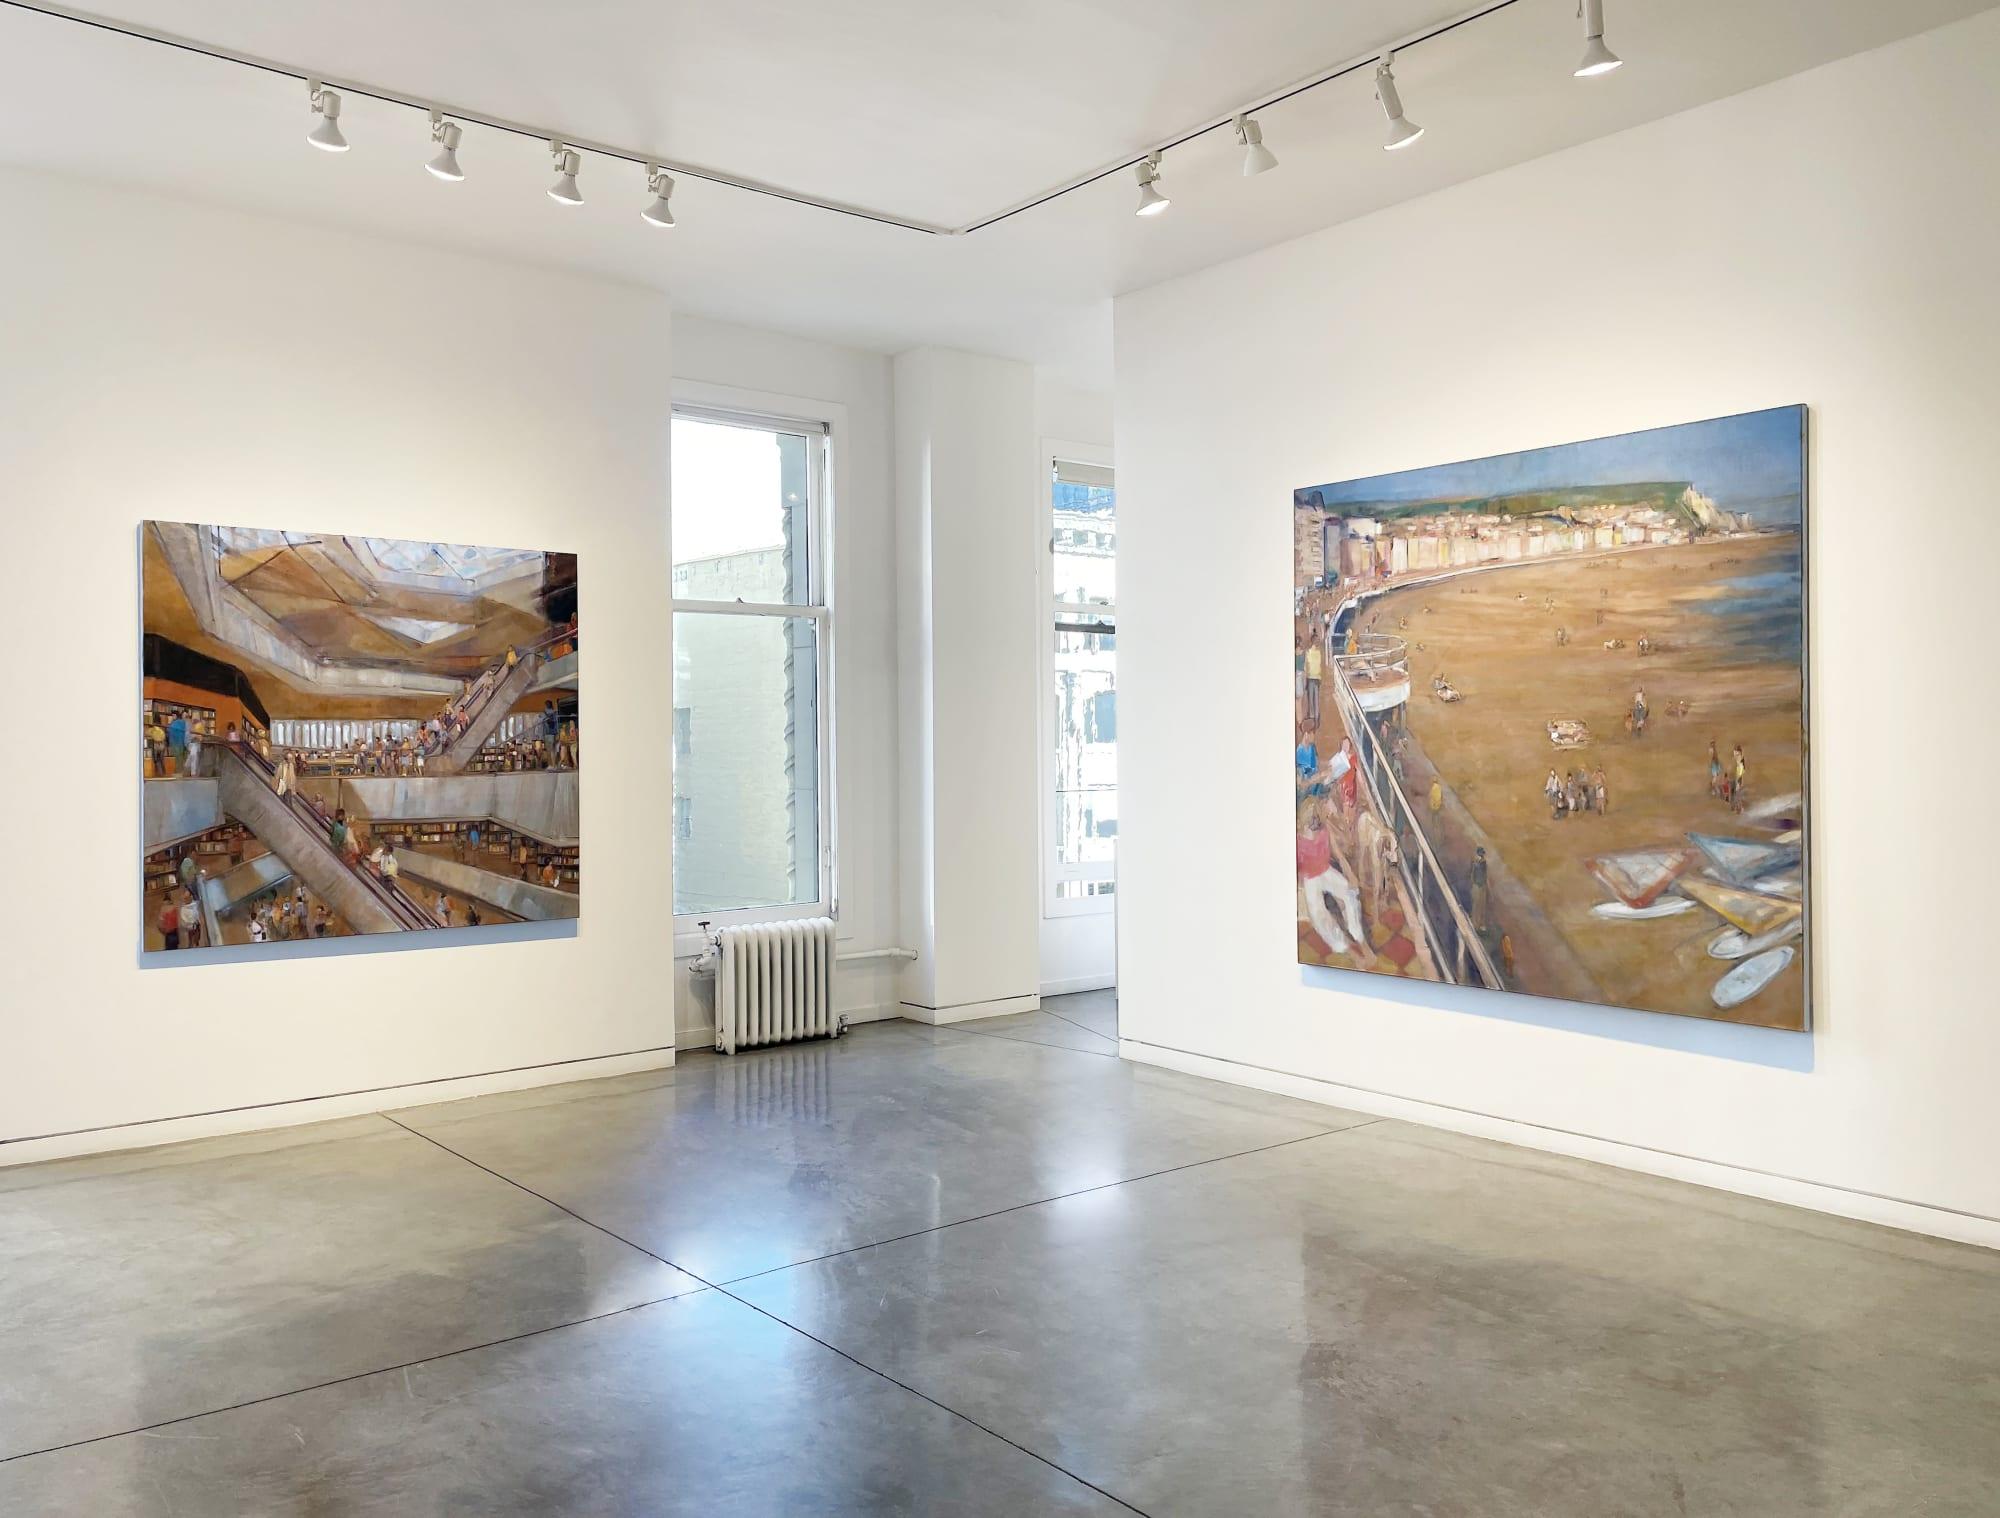 Gatherings: Recent Paintings by Simon Nicholas